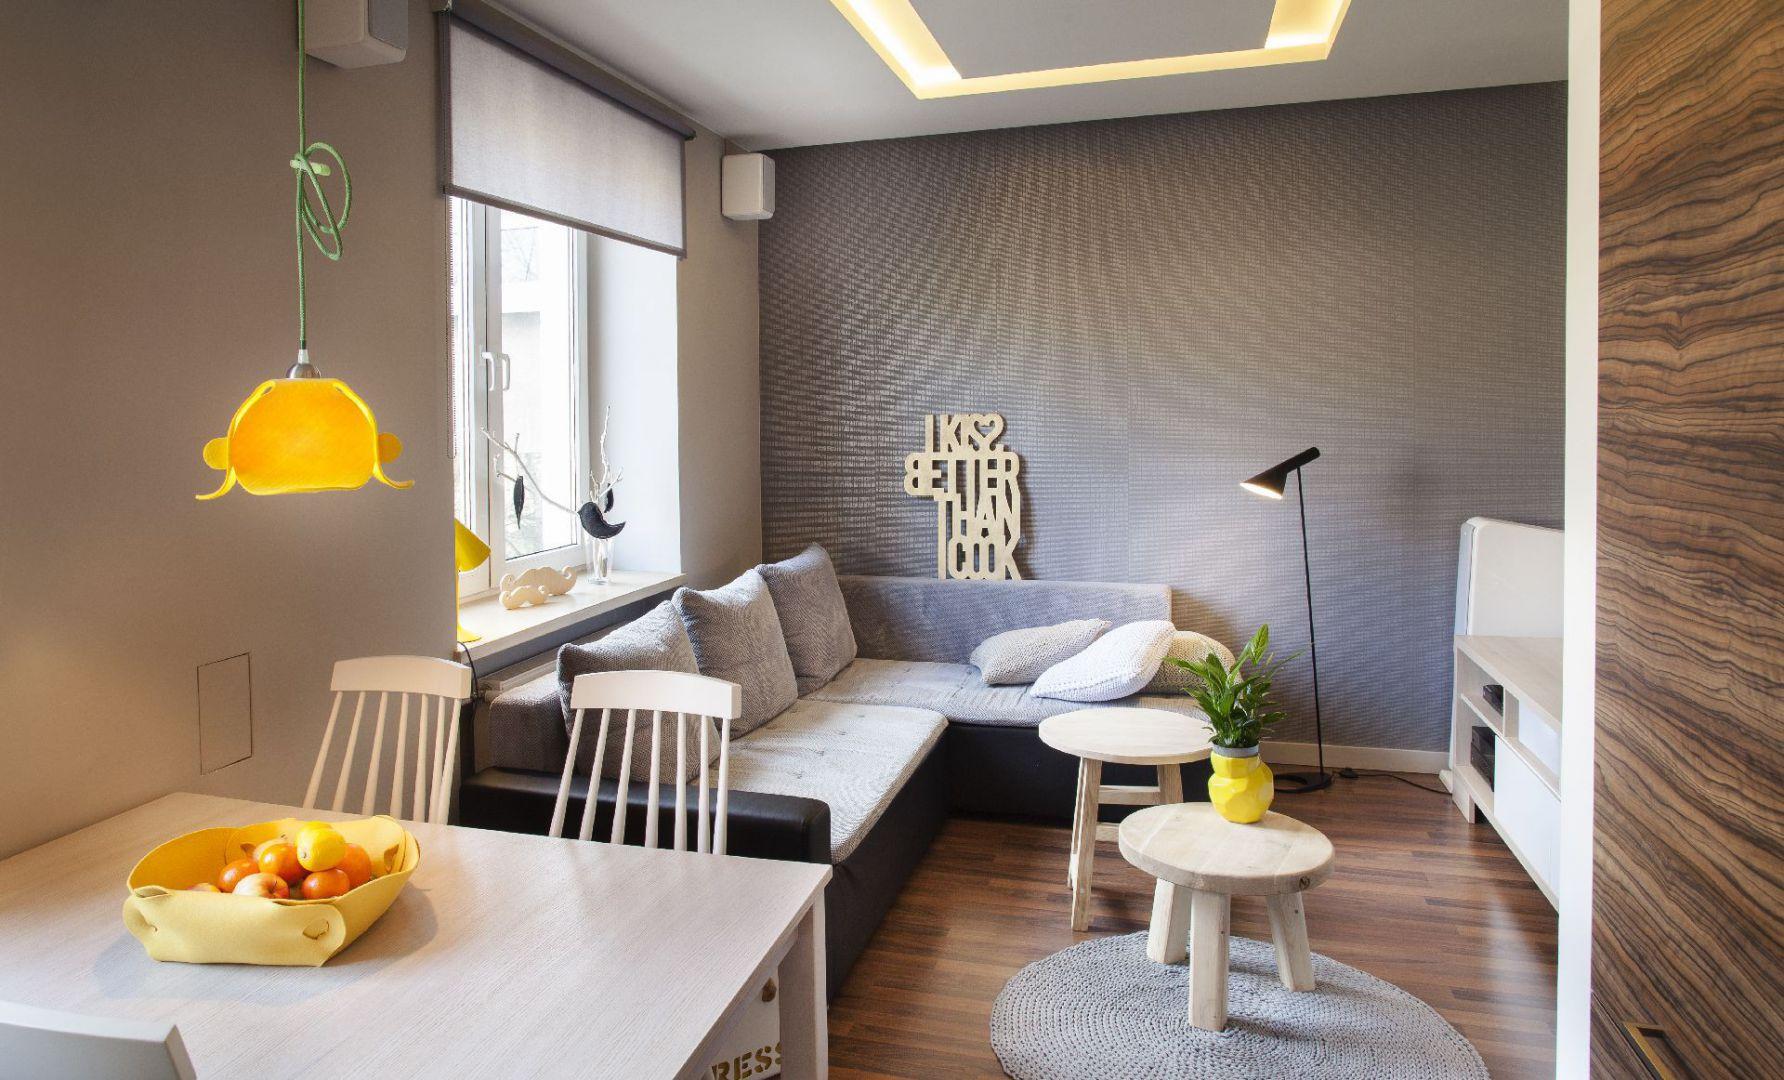 9 asia pytlewska ping pug design interior wnetrze klimt (22).jpg